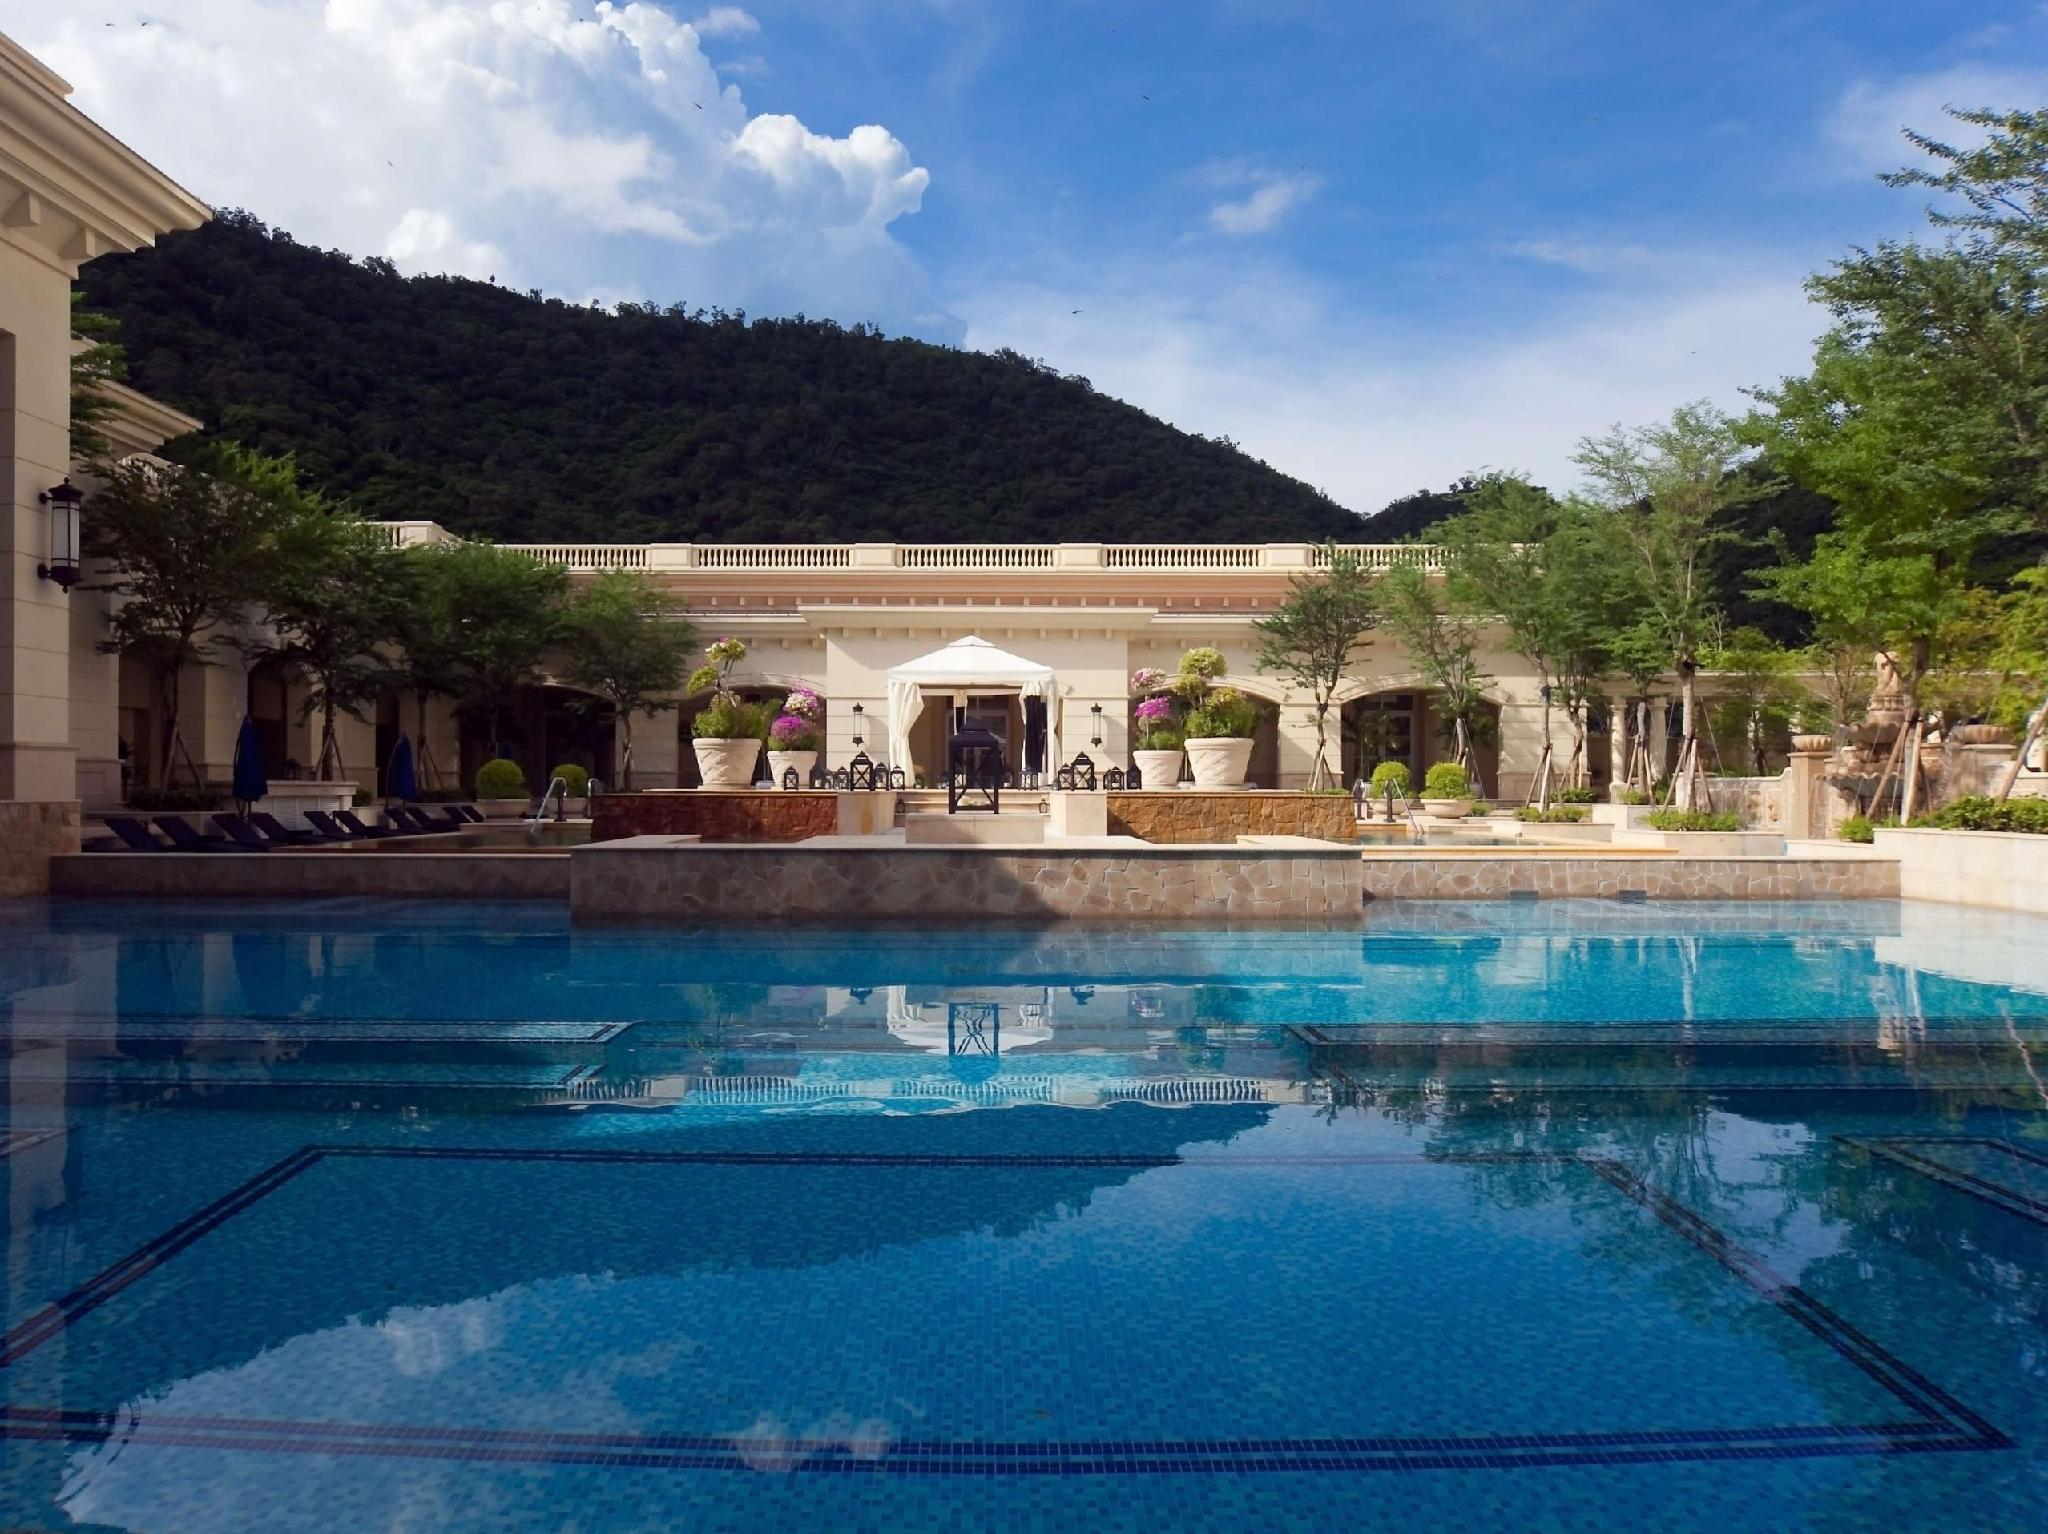 宜蘭縣瓏山林蘇澳冷熱泉度假飯店 (RSL Cold & Hot Springs Resort Suao)線上訂房|Agoda.com